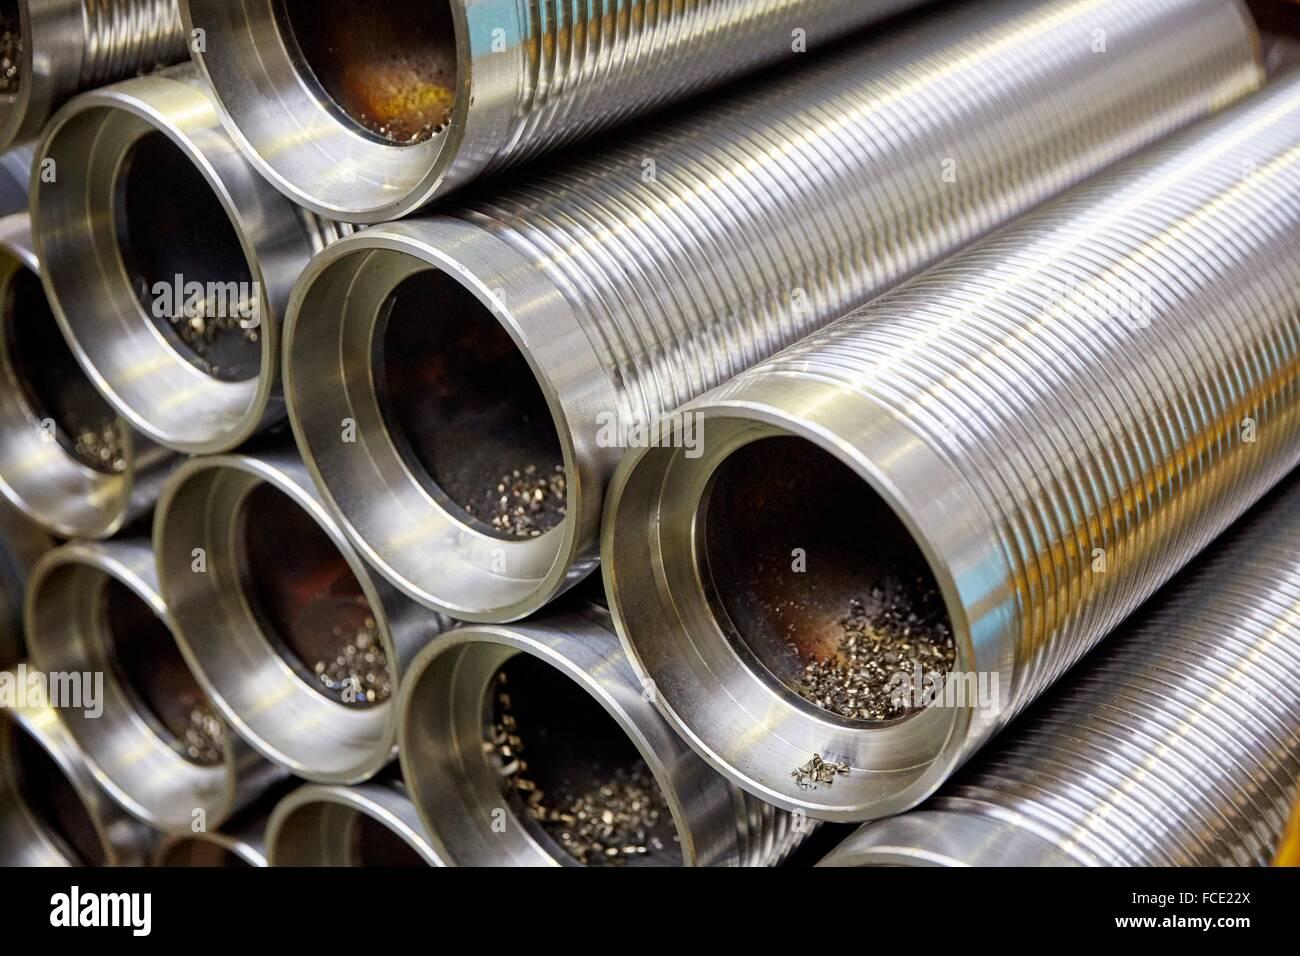 Metallic axis. Industry. Gipuzkoa. Basque Country. Spain. - Stock Image